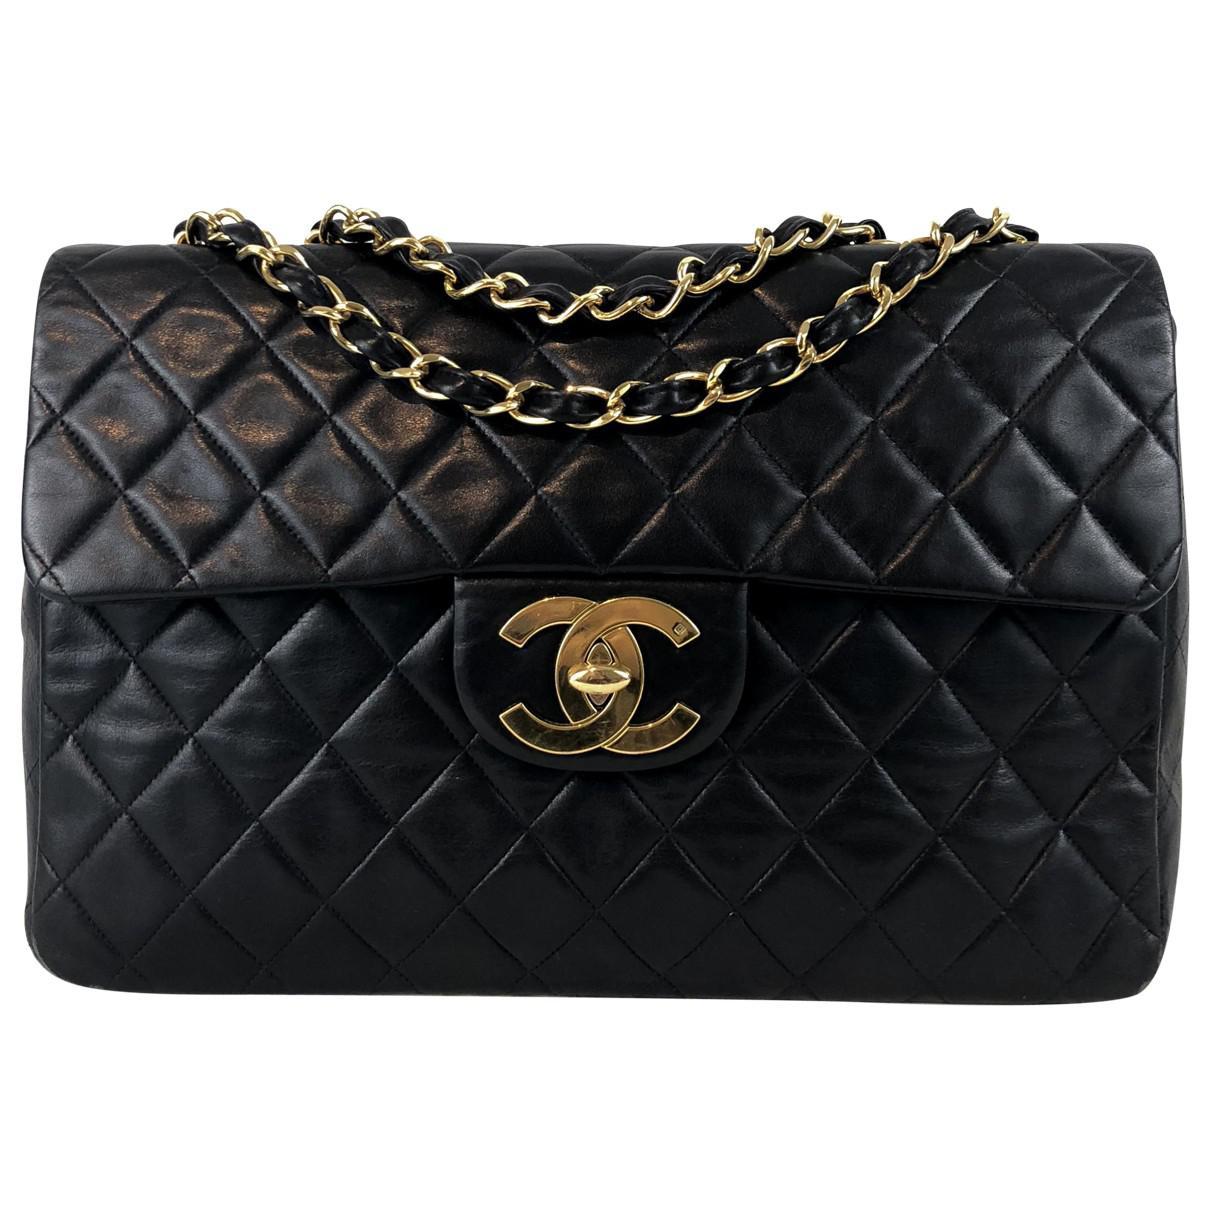 67ca6f5156bb Lyst - Chanel Timeless Leather Crossbody Bag in Black